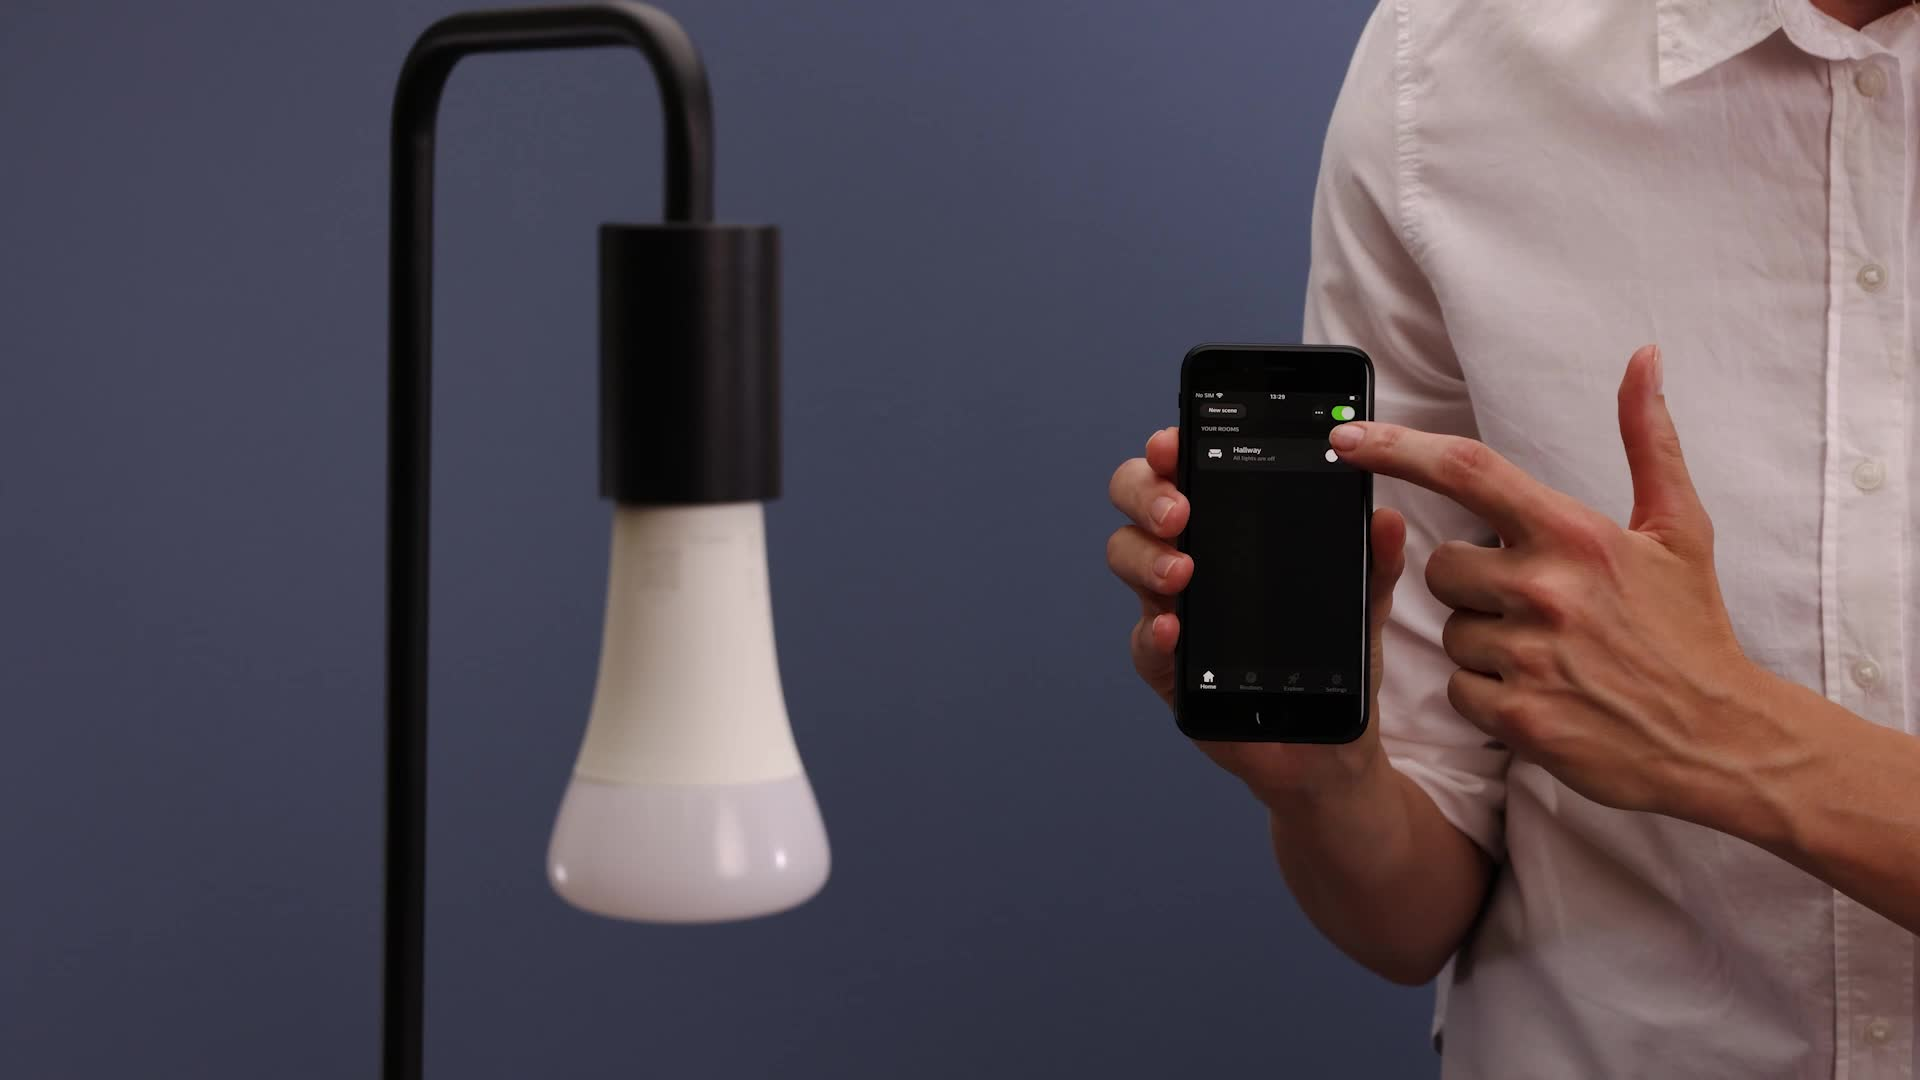 Philips Hue Bombilla Inteligente LED E27, 100W, con Bluetooth, Luz Blanca Cálida, Compatible con Alexa y Google Home